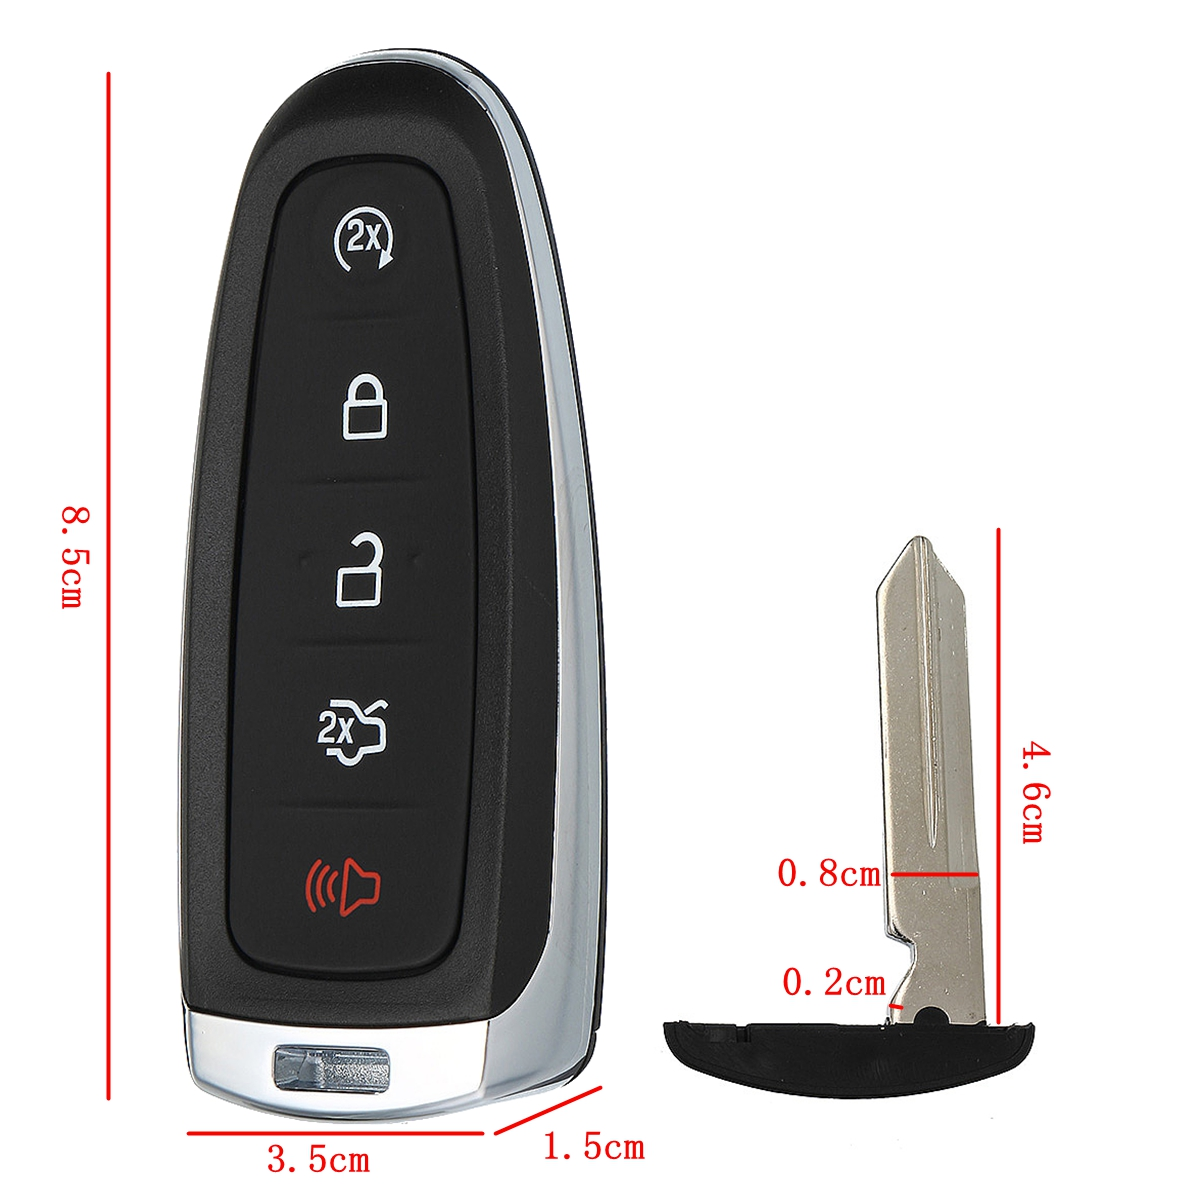 5 Buttons Remote Key Fob Case Shell For Ford Edge Explorer Escape Flex Focus